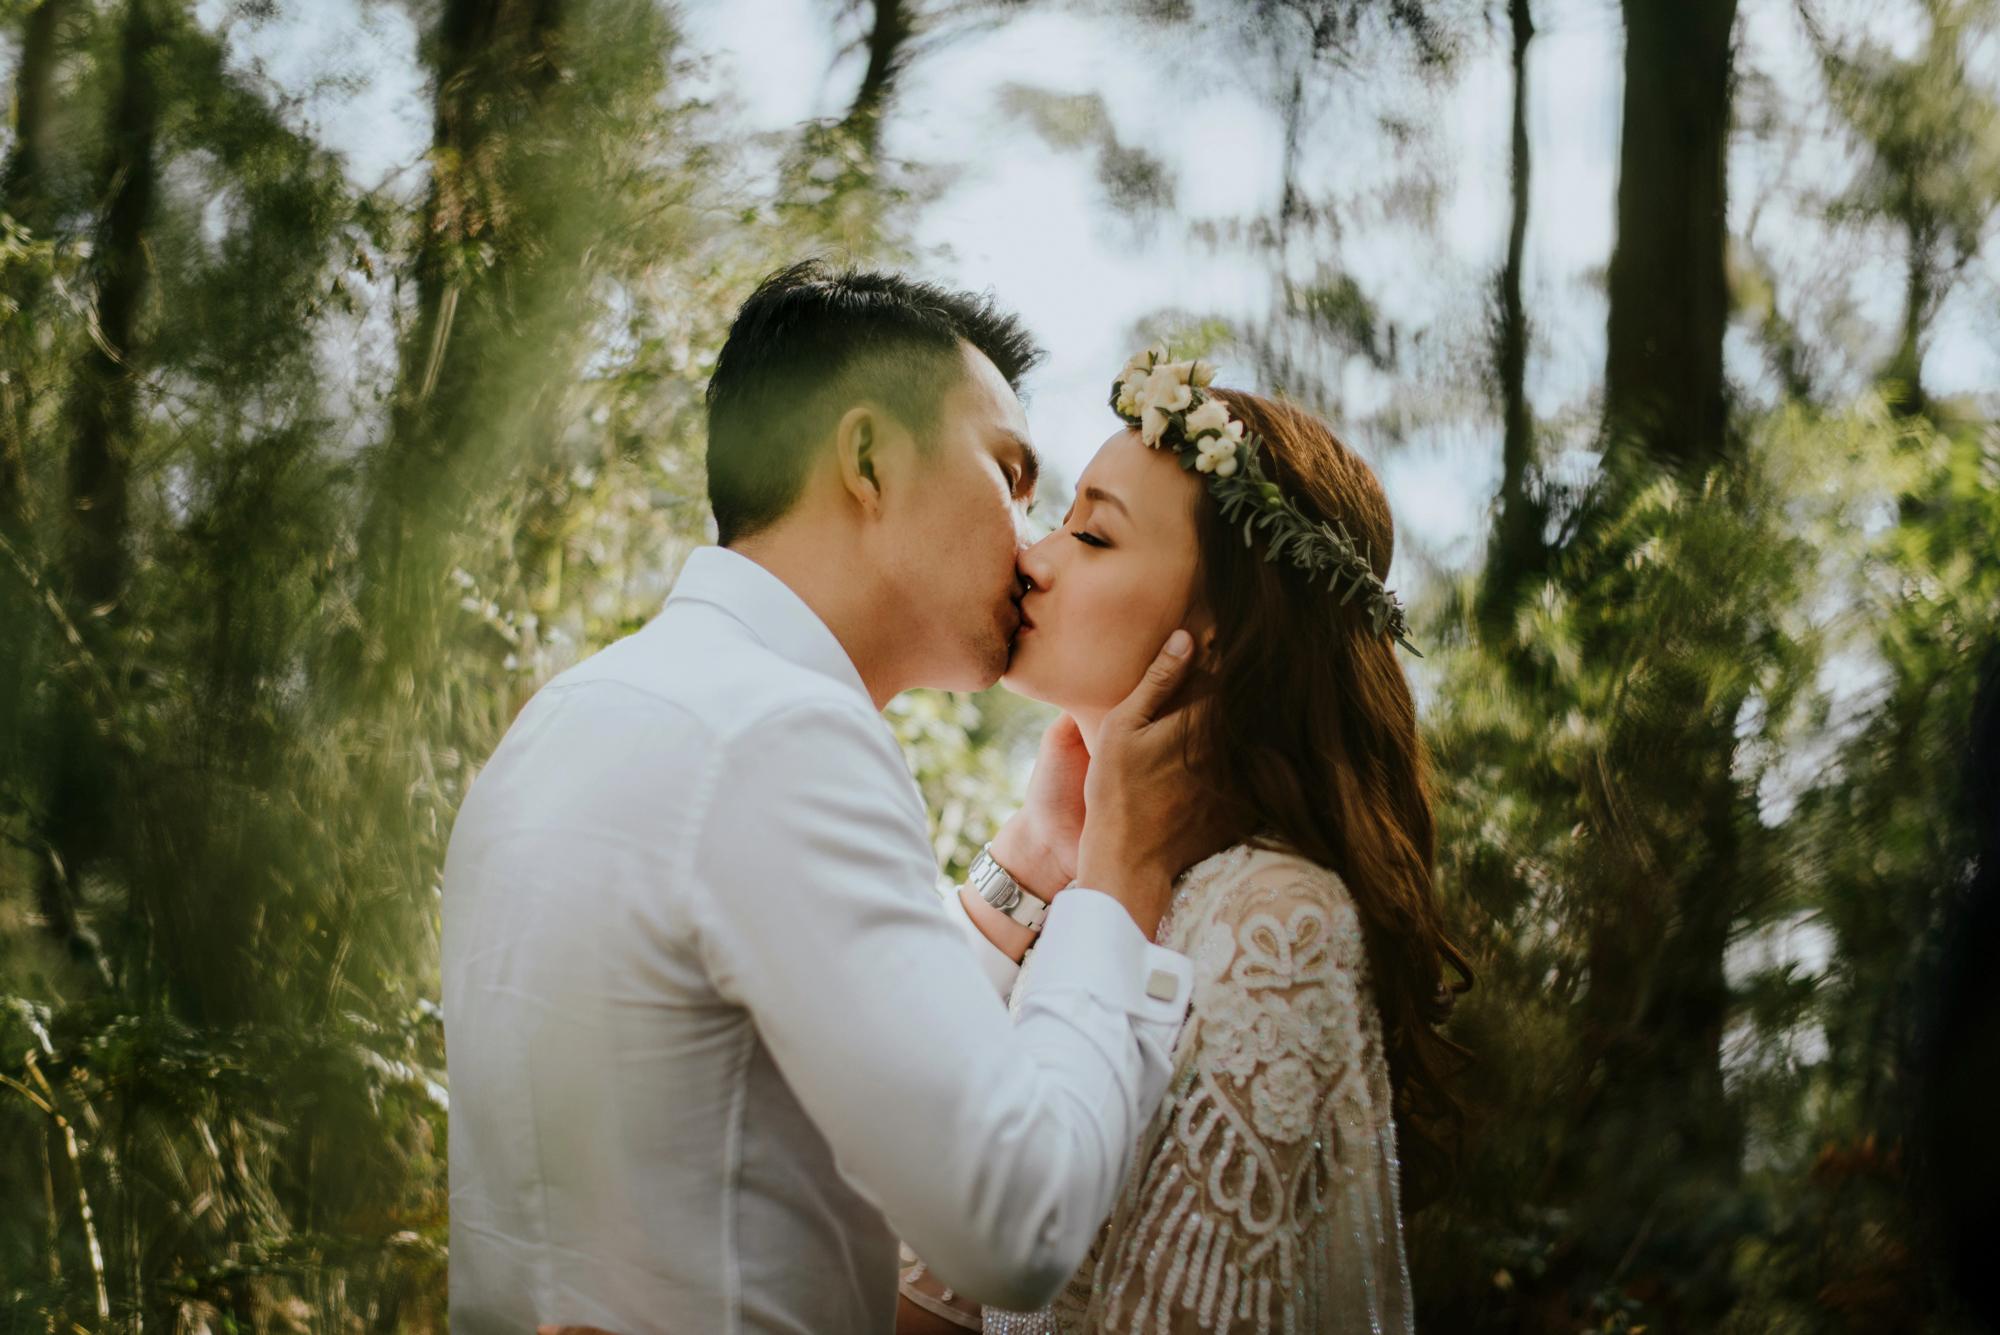 048-melbourne-prewedding-engagement-photography